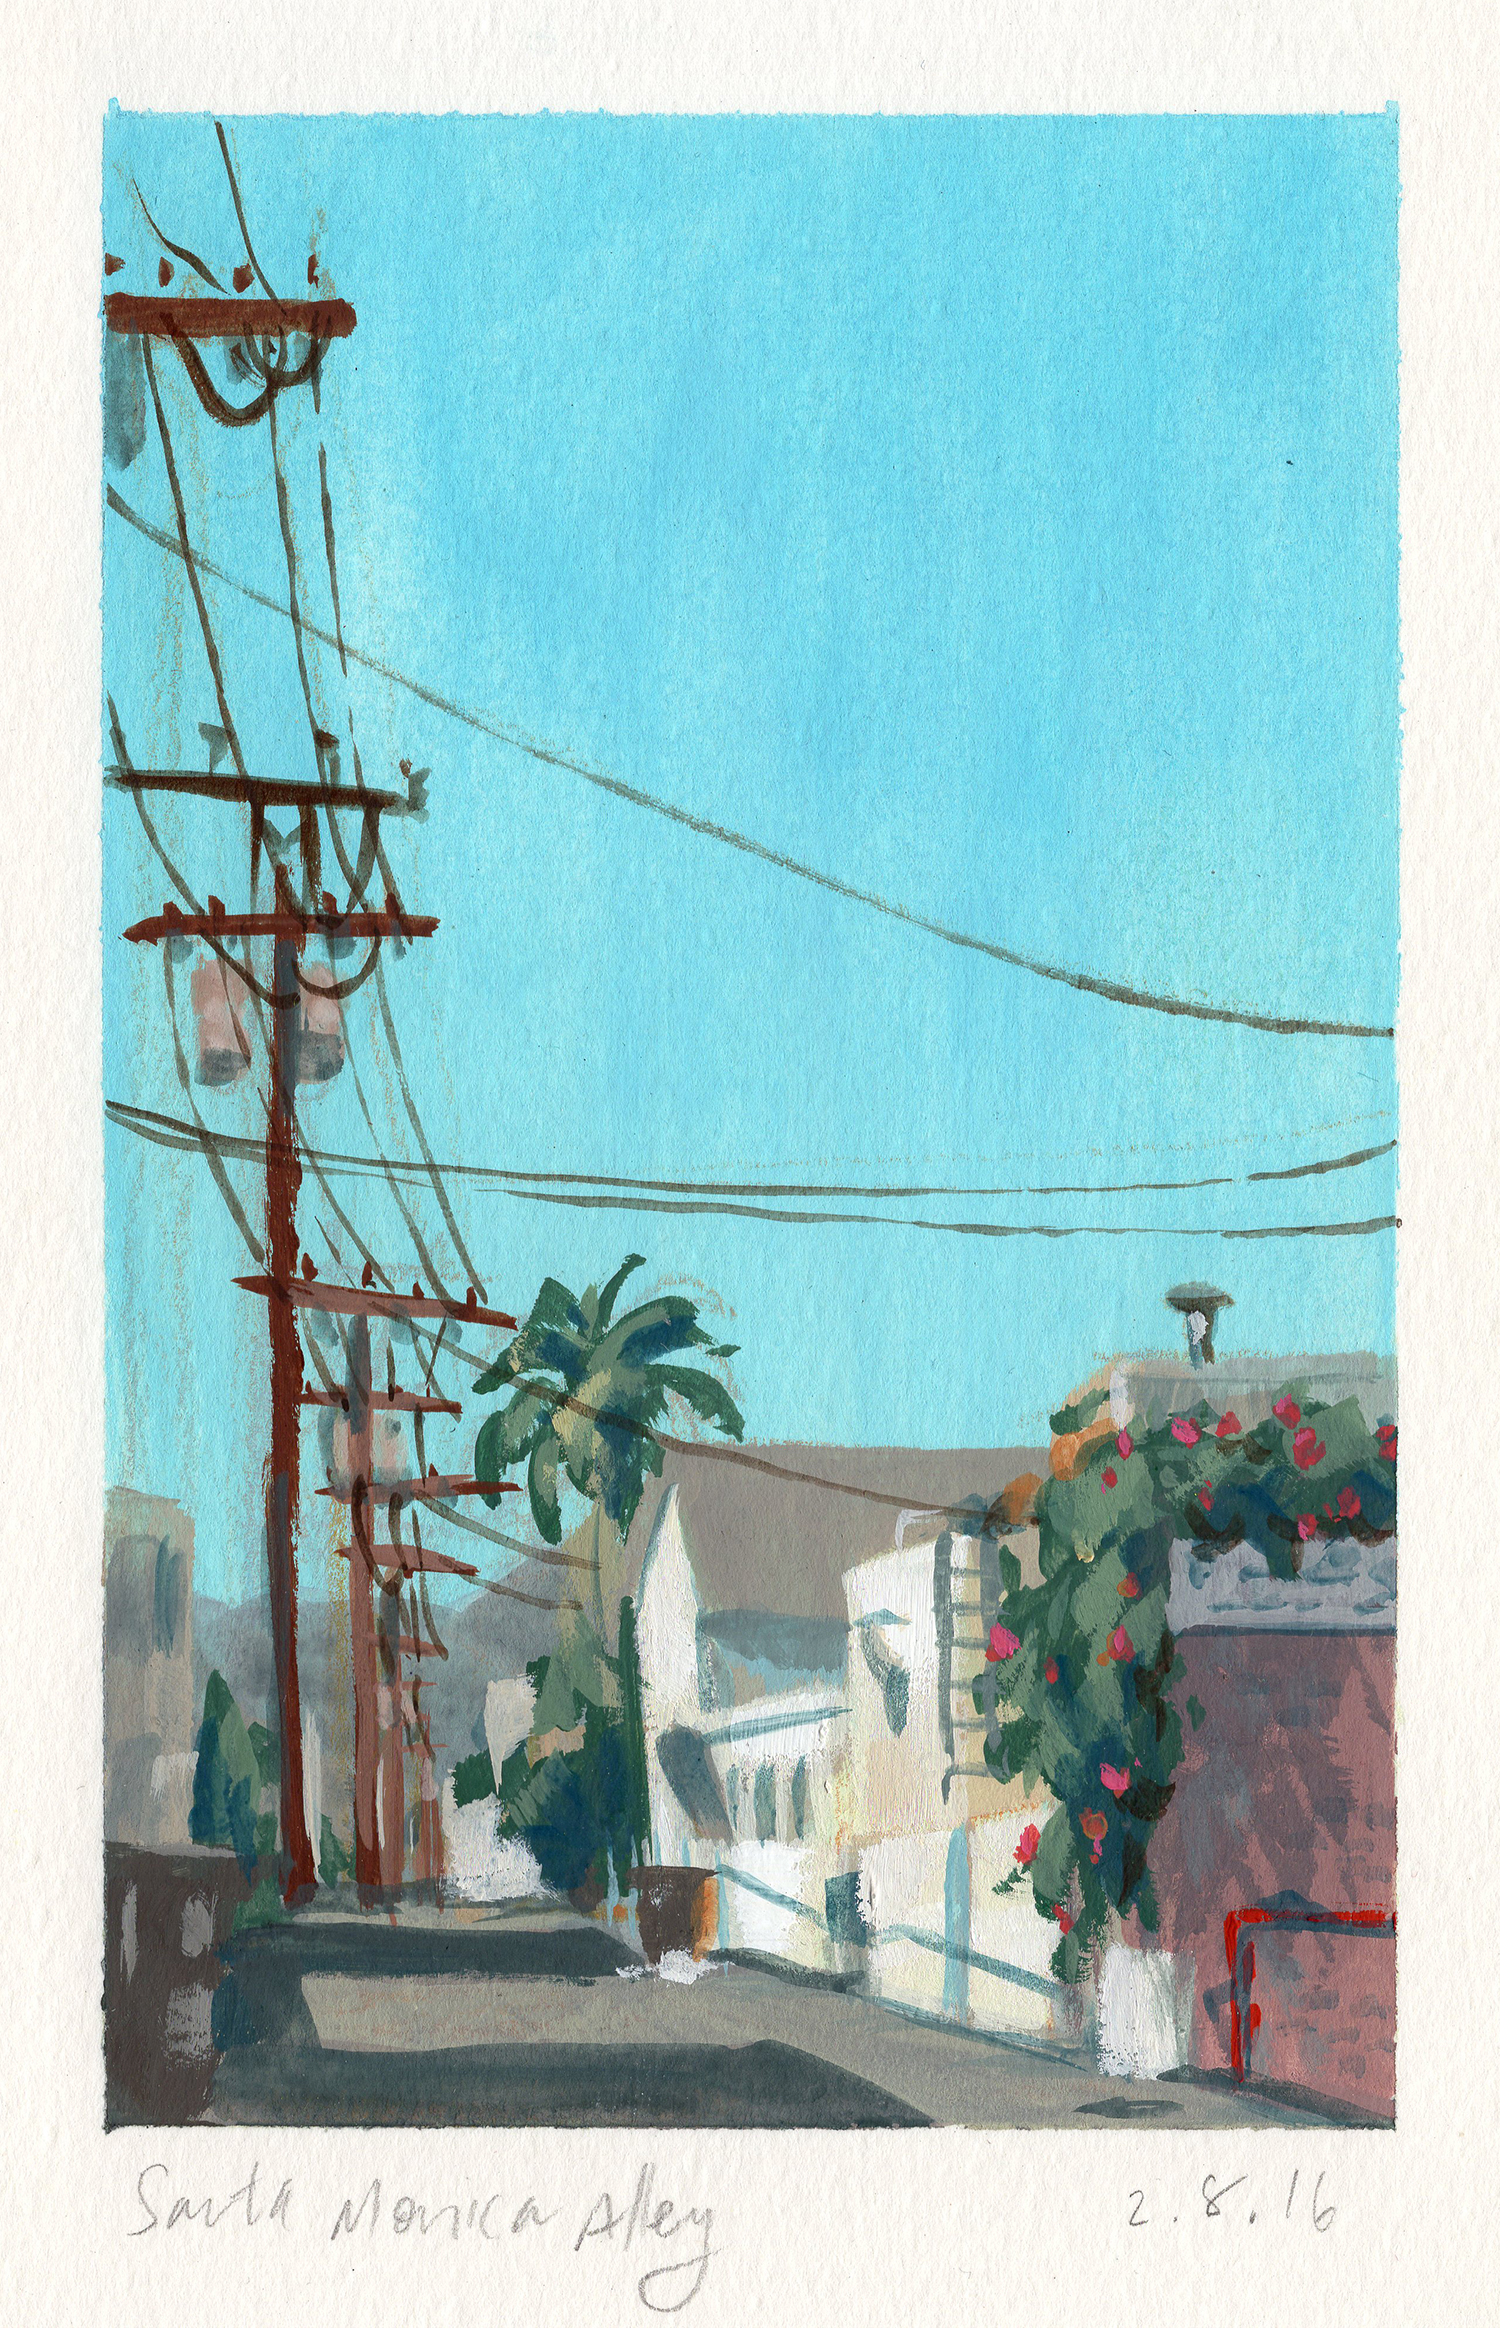 Santa Monica Alley_4x6.5.jpg